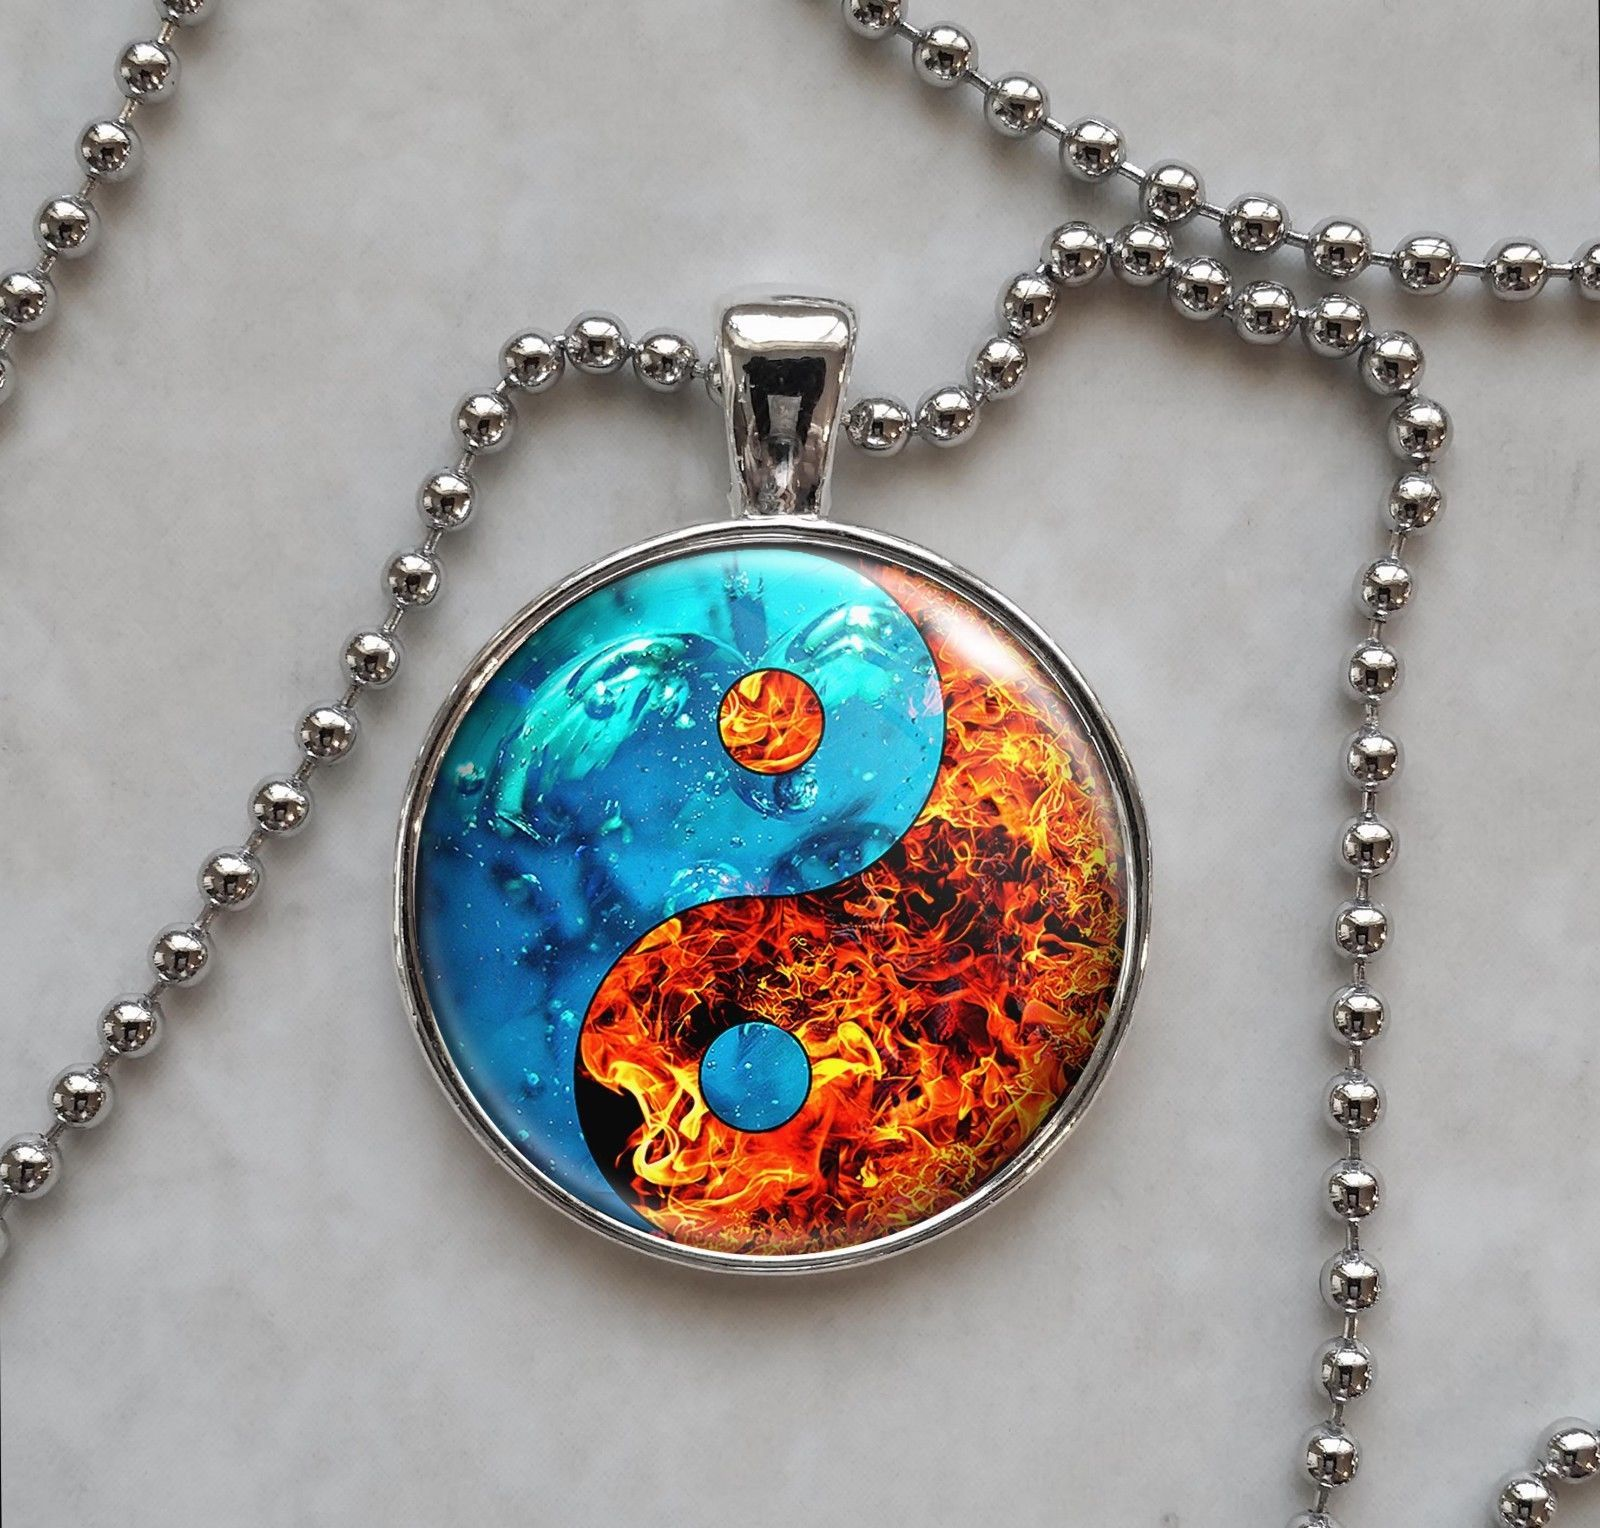 Fire Water Yin Yang Taoism Confucianism Pendant Necklace